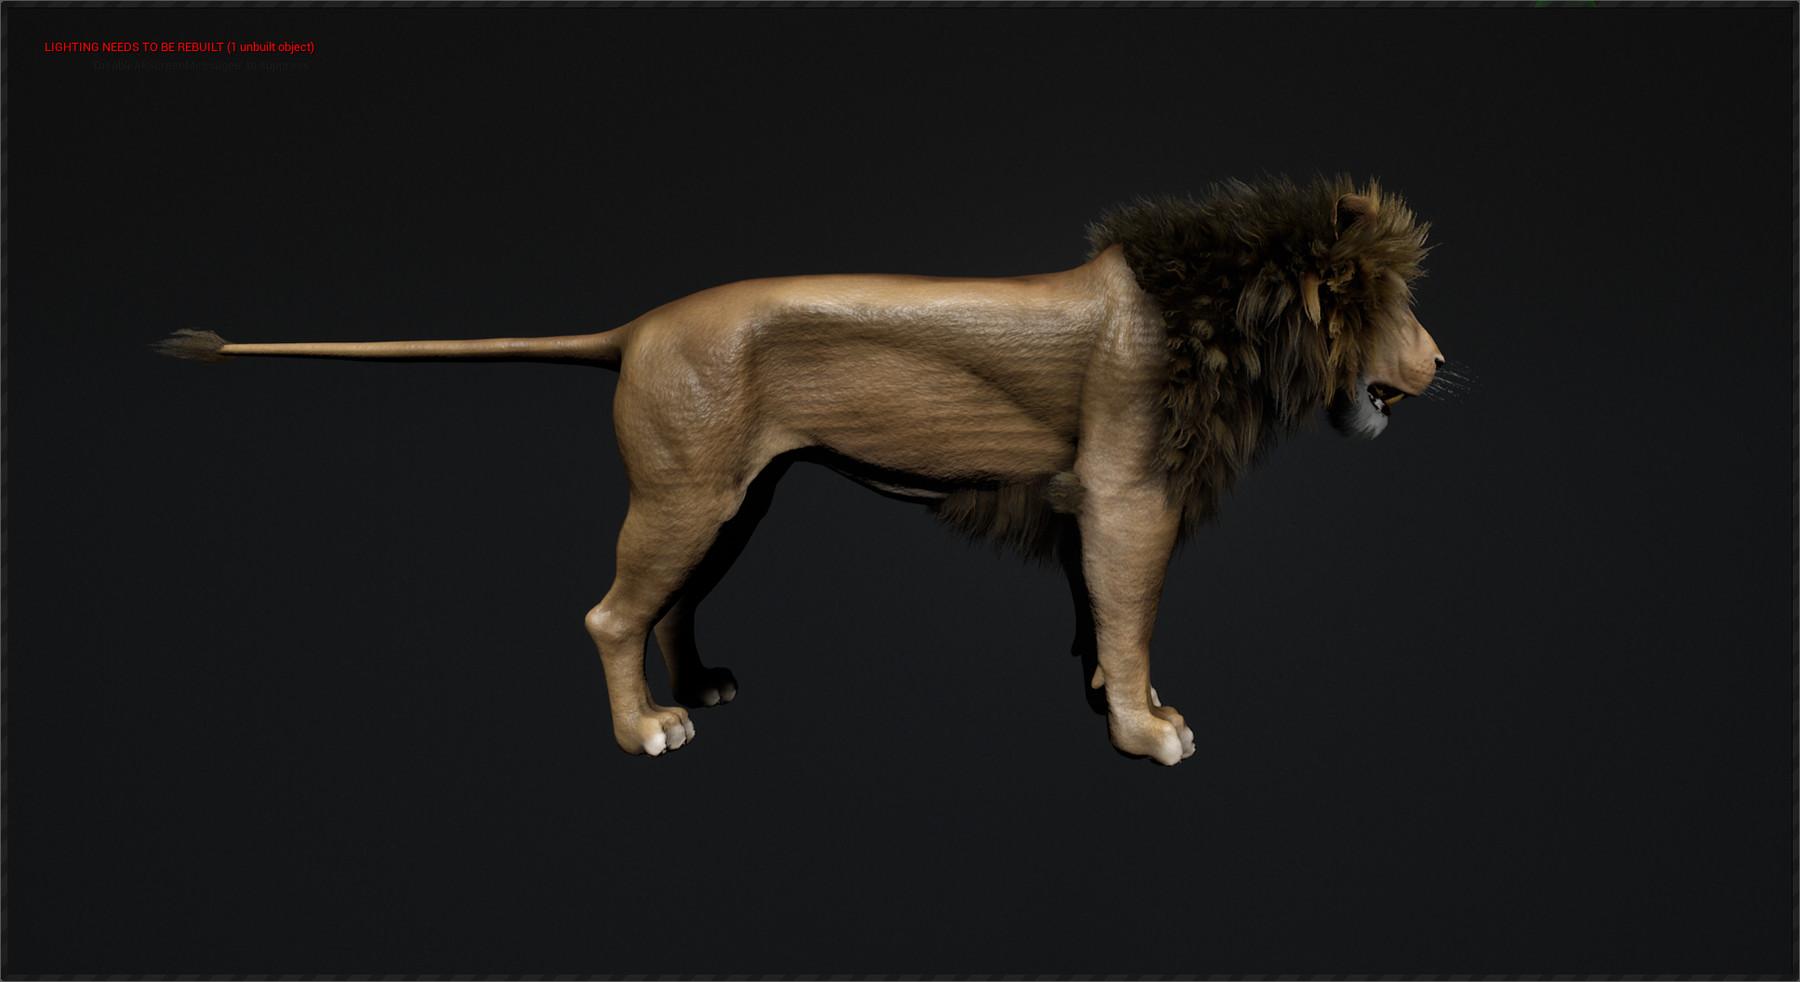 Truong CG Artist - Tobias Lion Maya rig